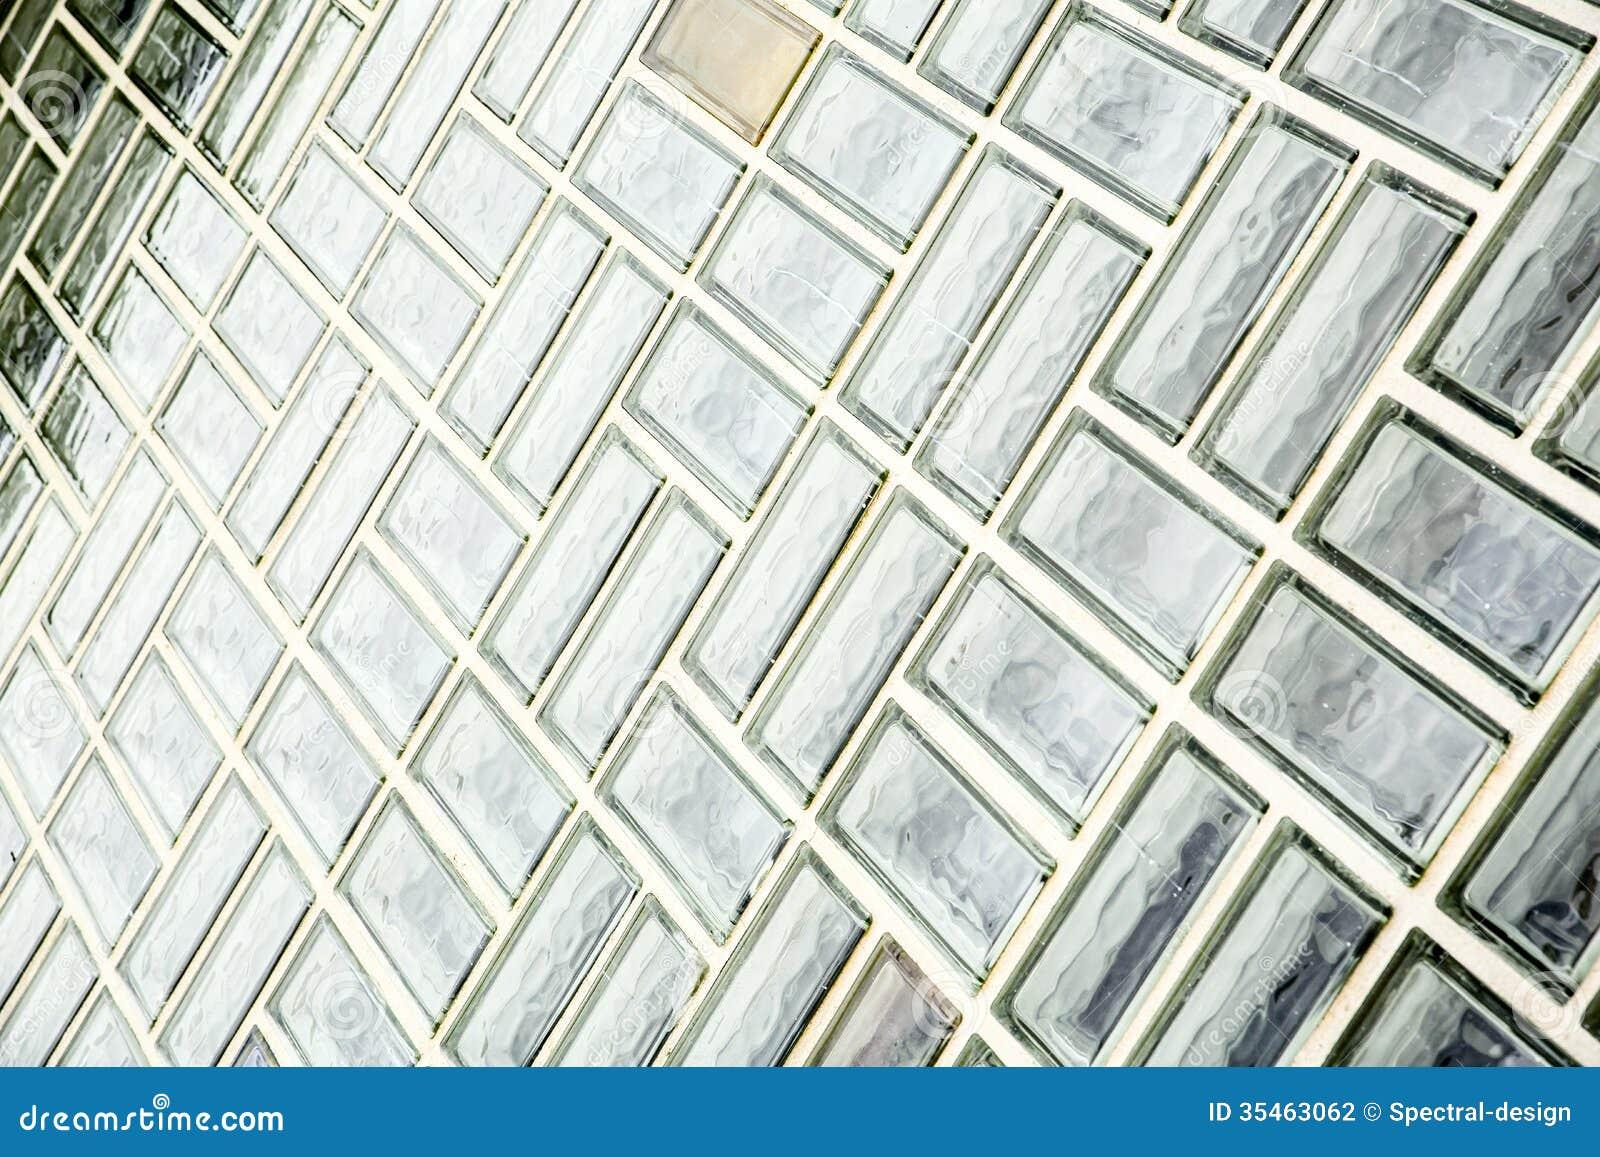 Glass Brick Wall Stock Photography Image 35463062